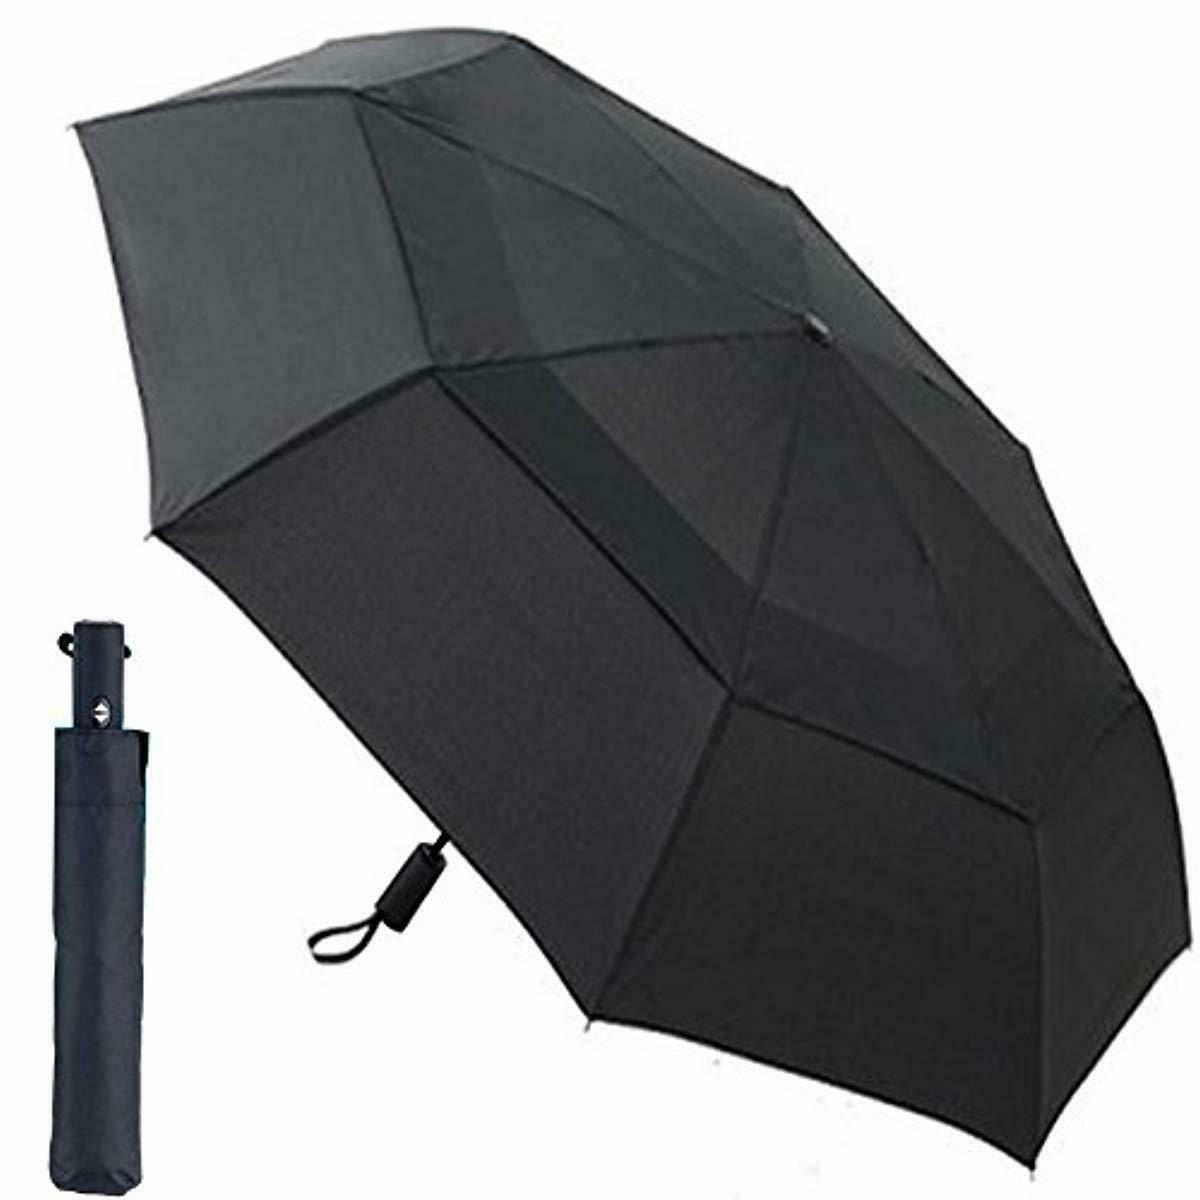 CNHY Travel Umbrella Folding Large Automatic Golf Umbrellas